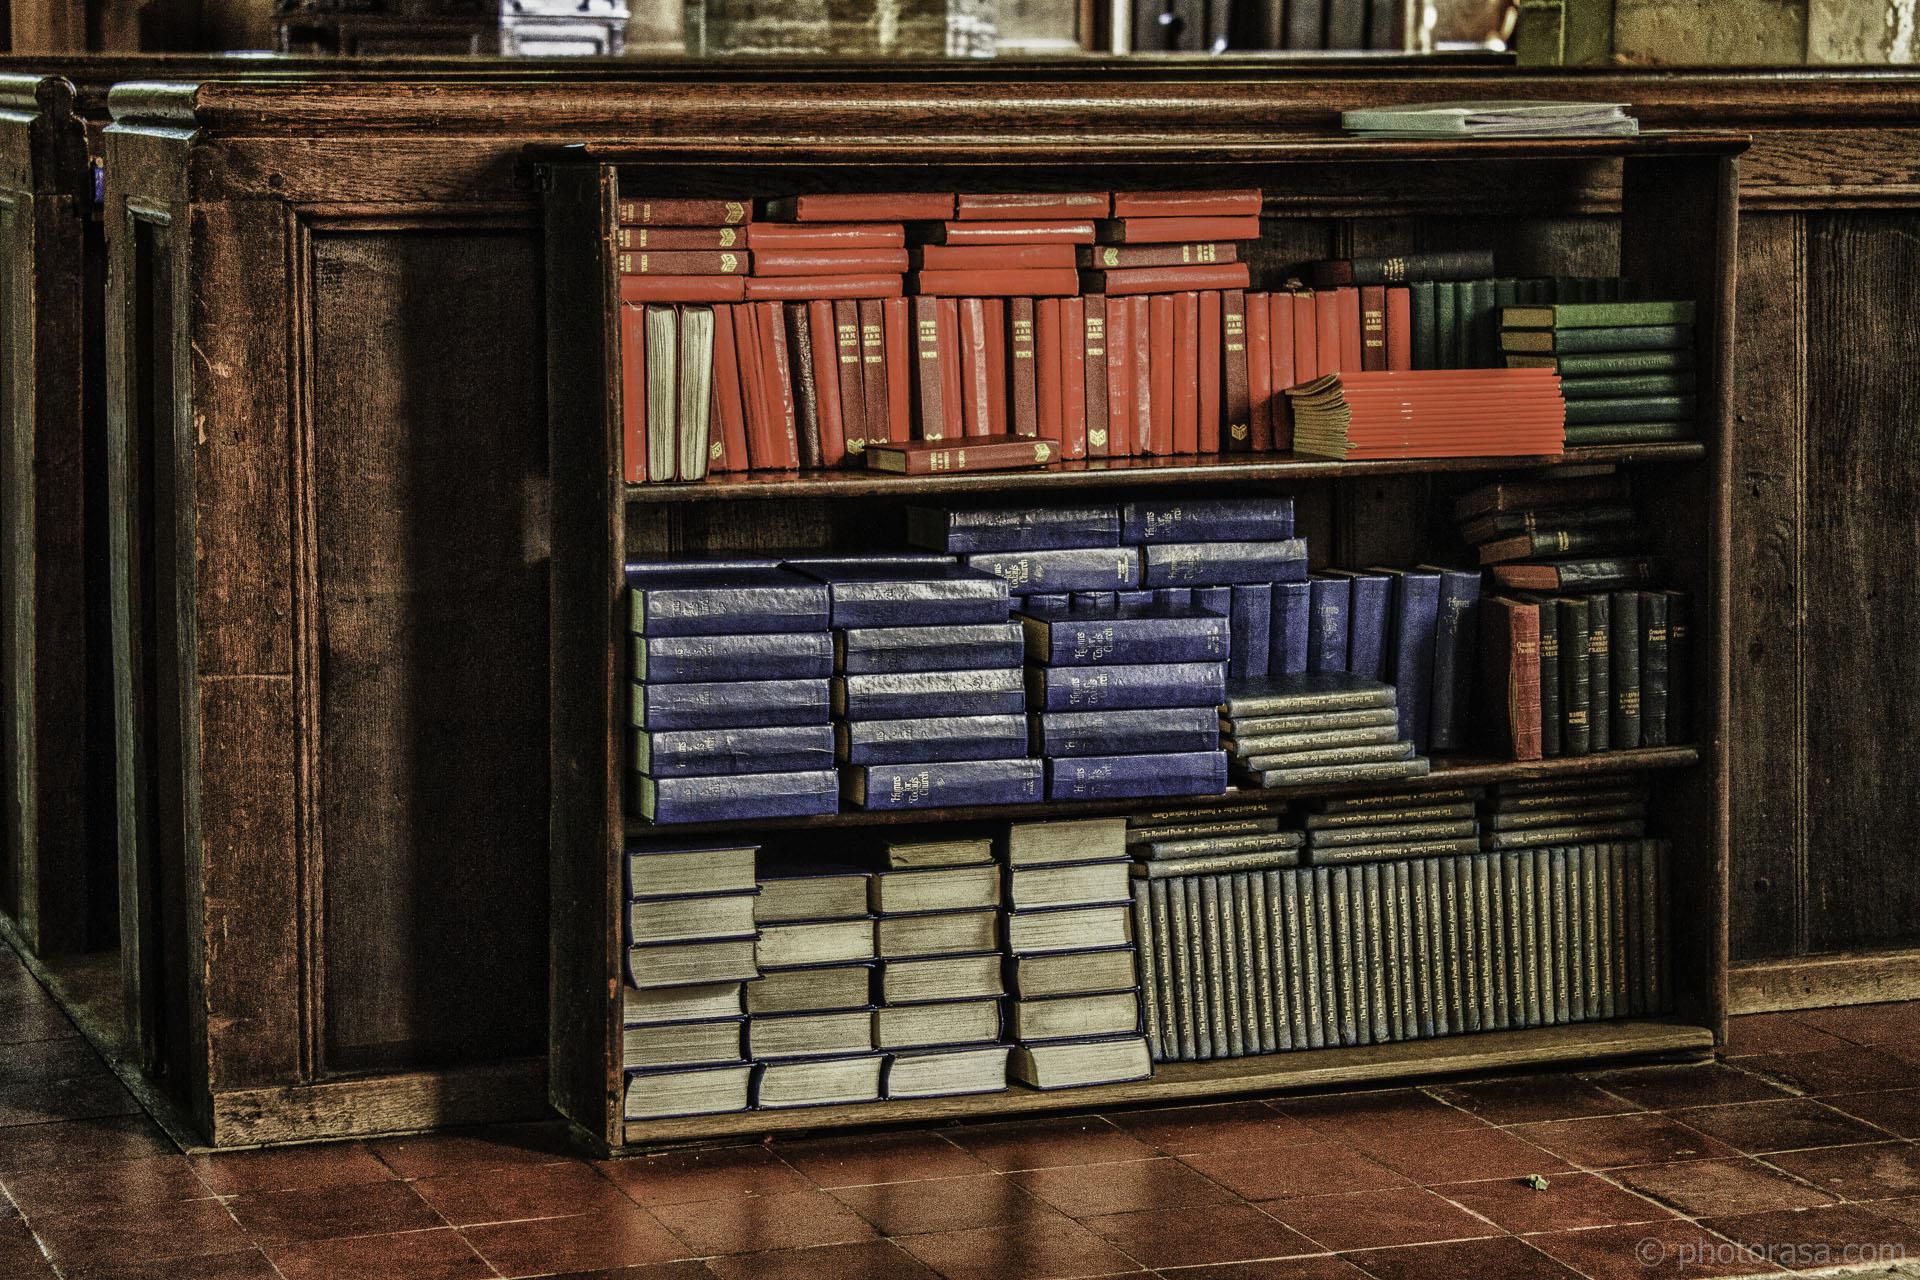 https://photorasa.com/st-marys-church-in-chiddingstone/bookshelf-with-prayer-books/